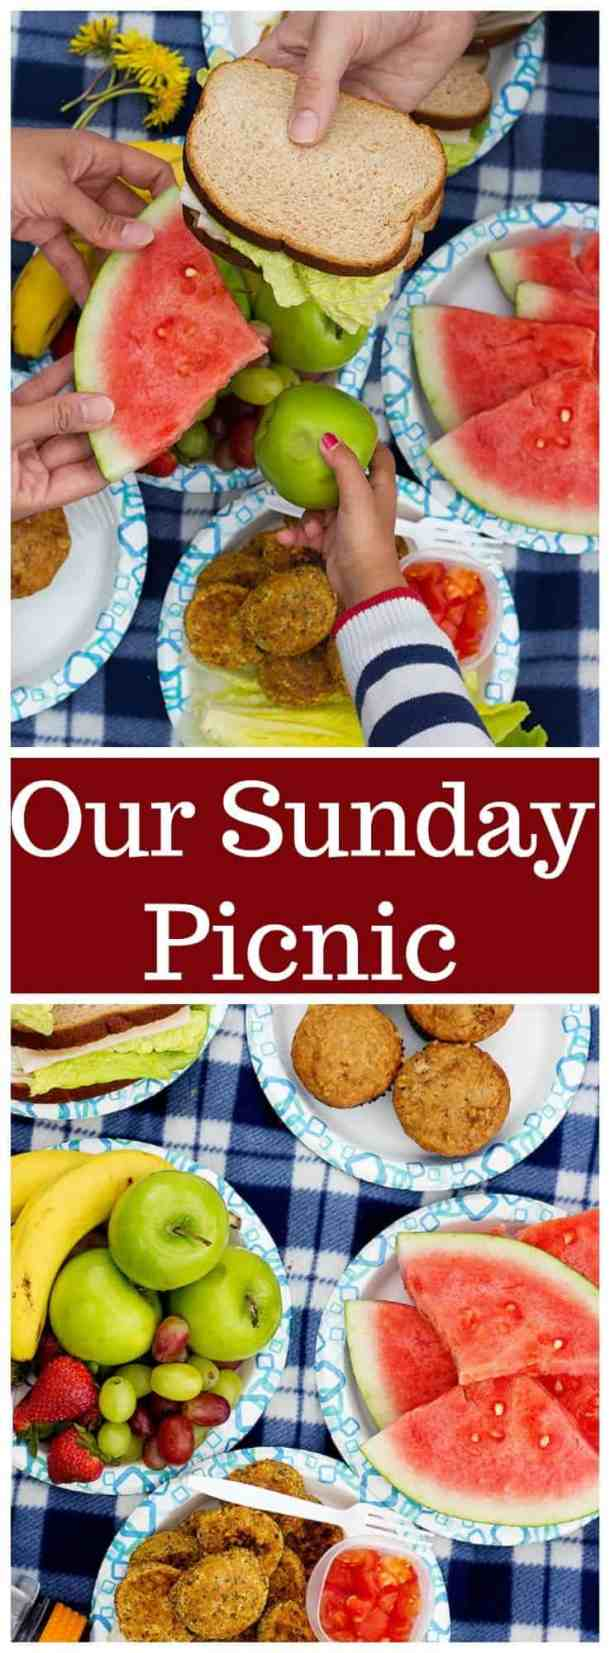 Sunday Picnic   Summer picnic   Spring Picnic   Easy Picnic   Picnic with family   Family Picnic   How to have a mess free picnic   UnicornsintheKitchen.com #picnic #picnicideas #sundaypicnic #summerpicnic